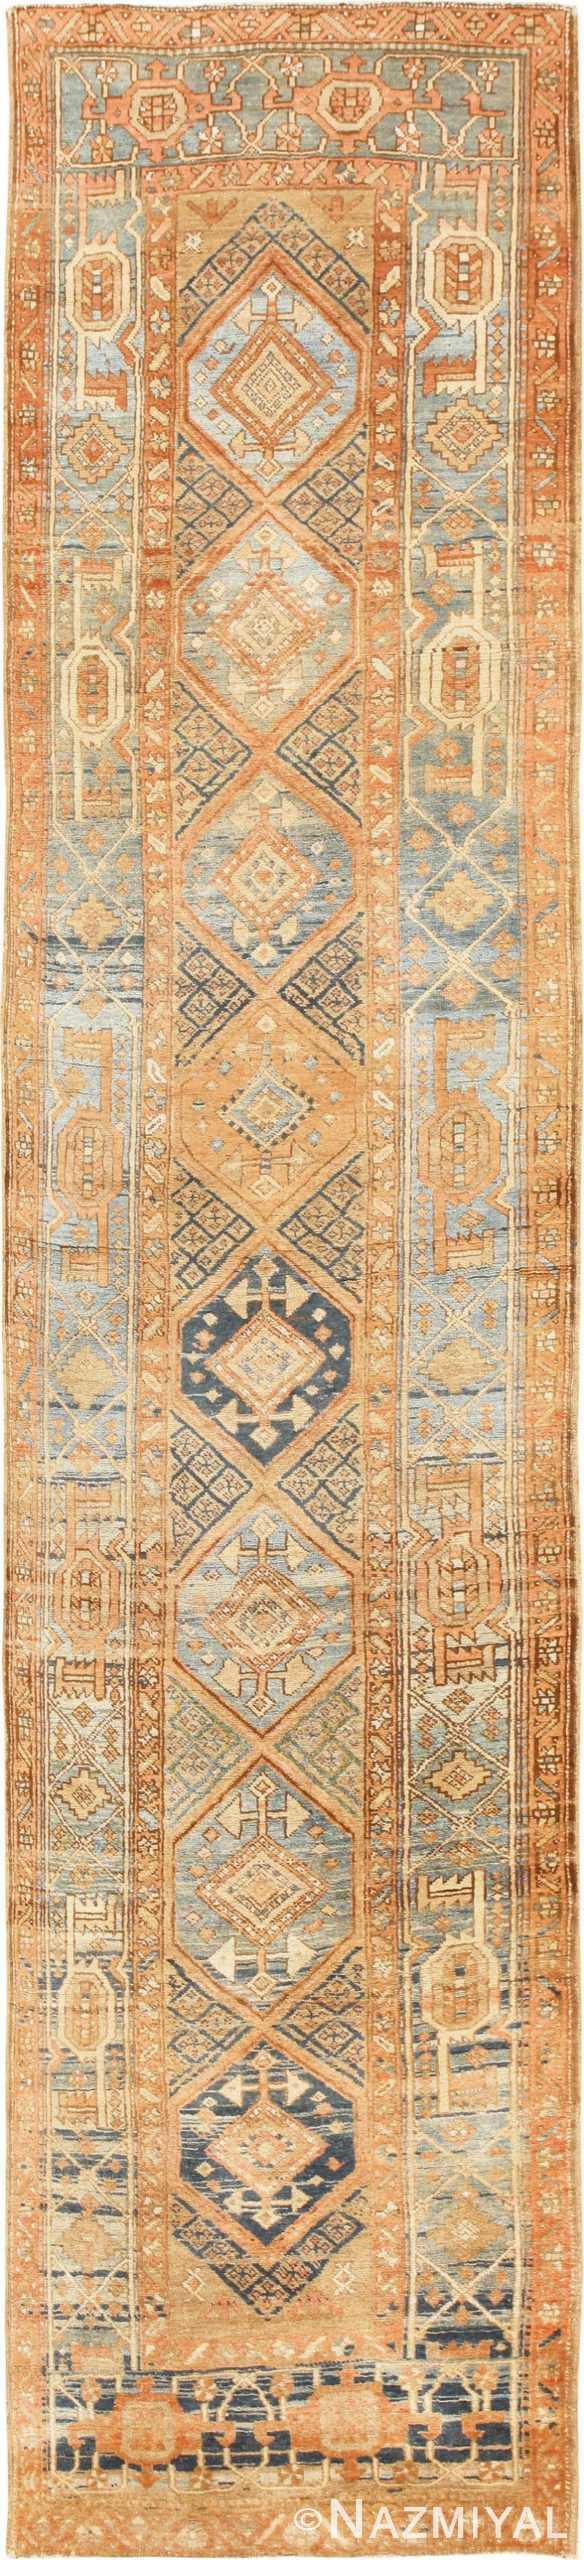 Tribal Antique Persian Heriz Serapi Runner Rug 48994 Nazmiyal